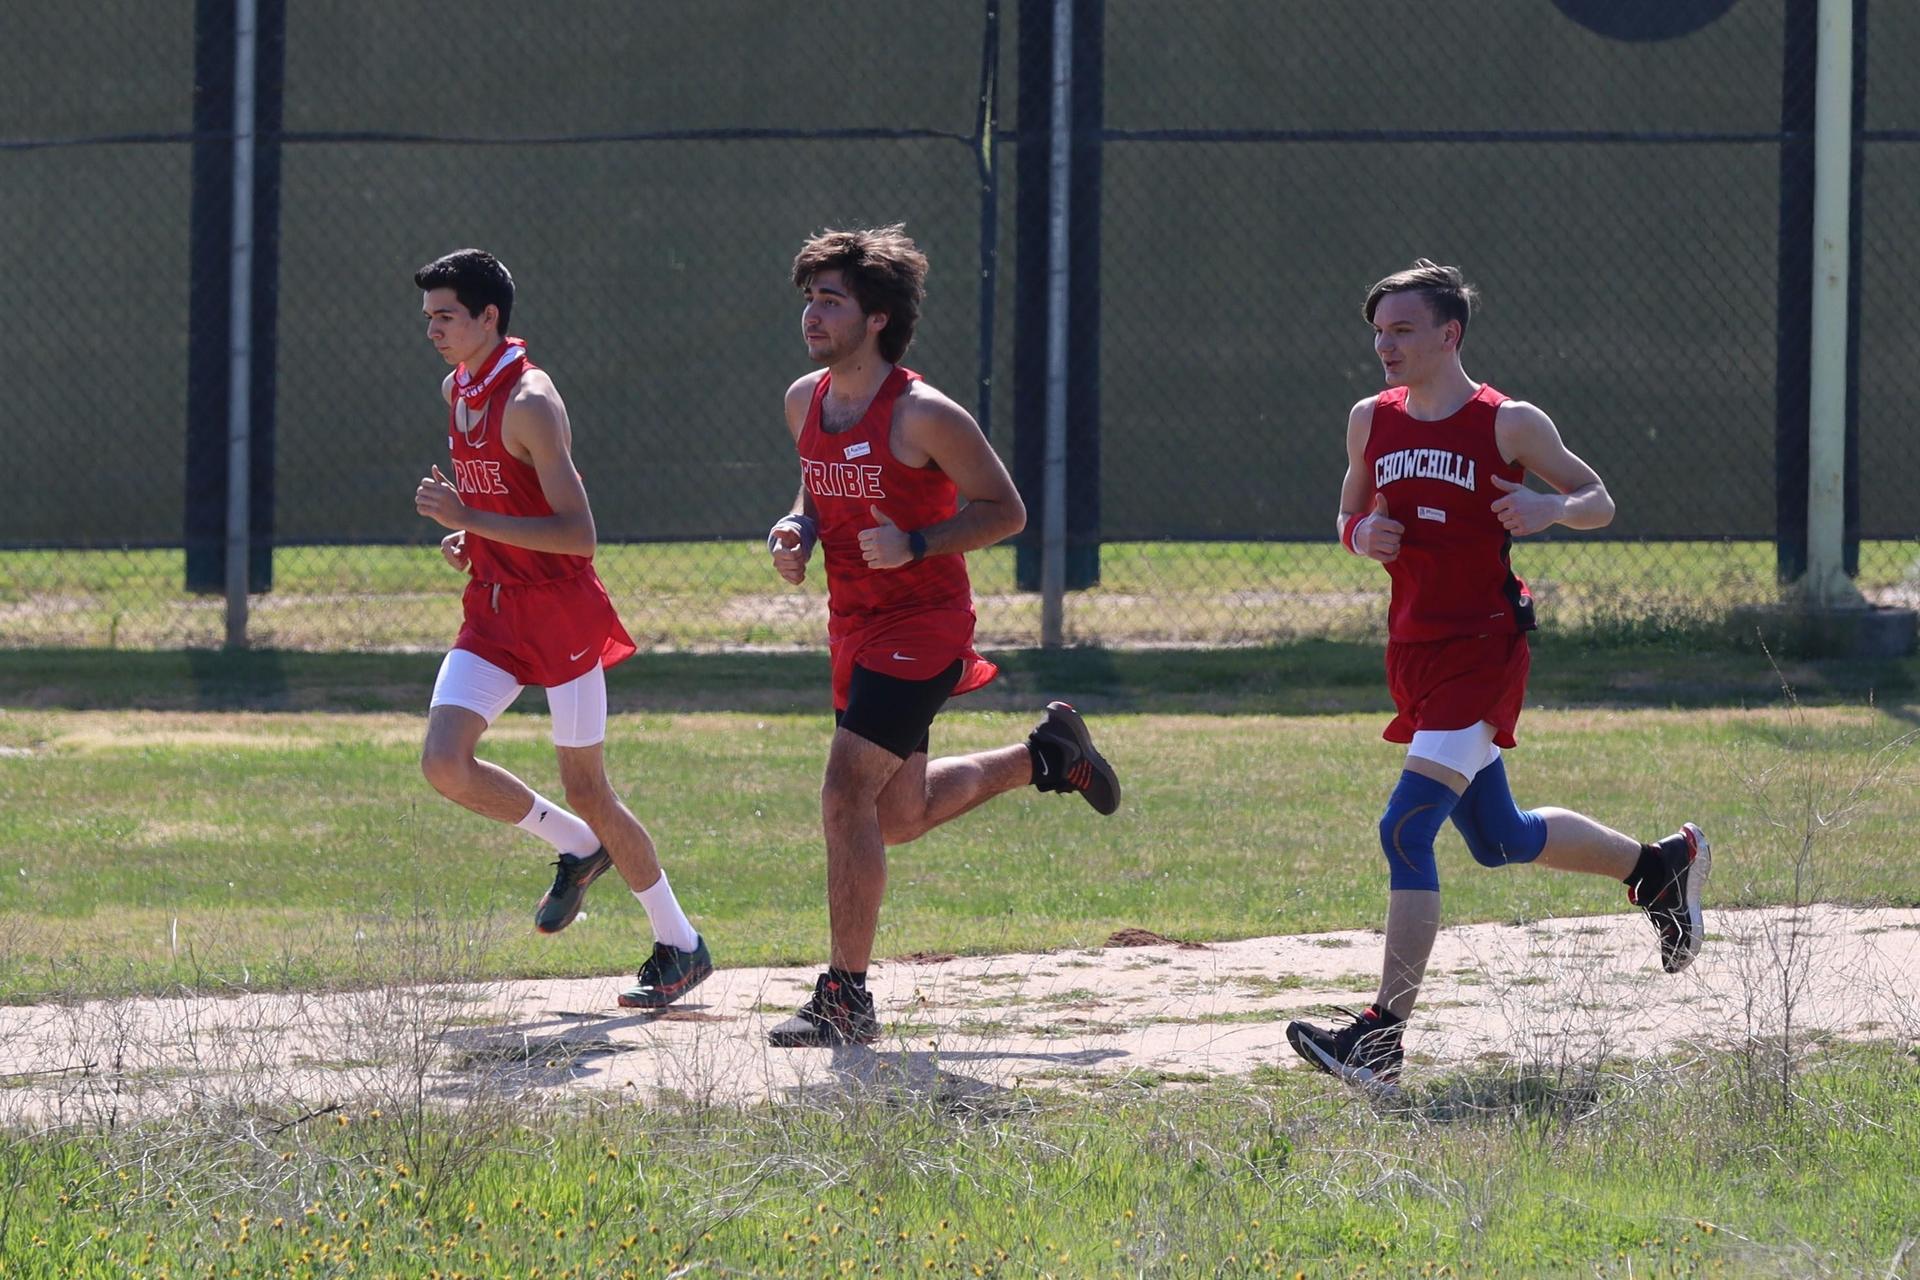 chowchilla boys running at liberty high school